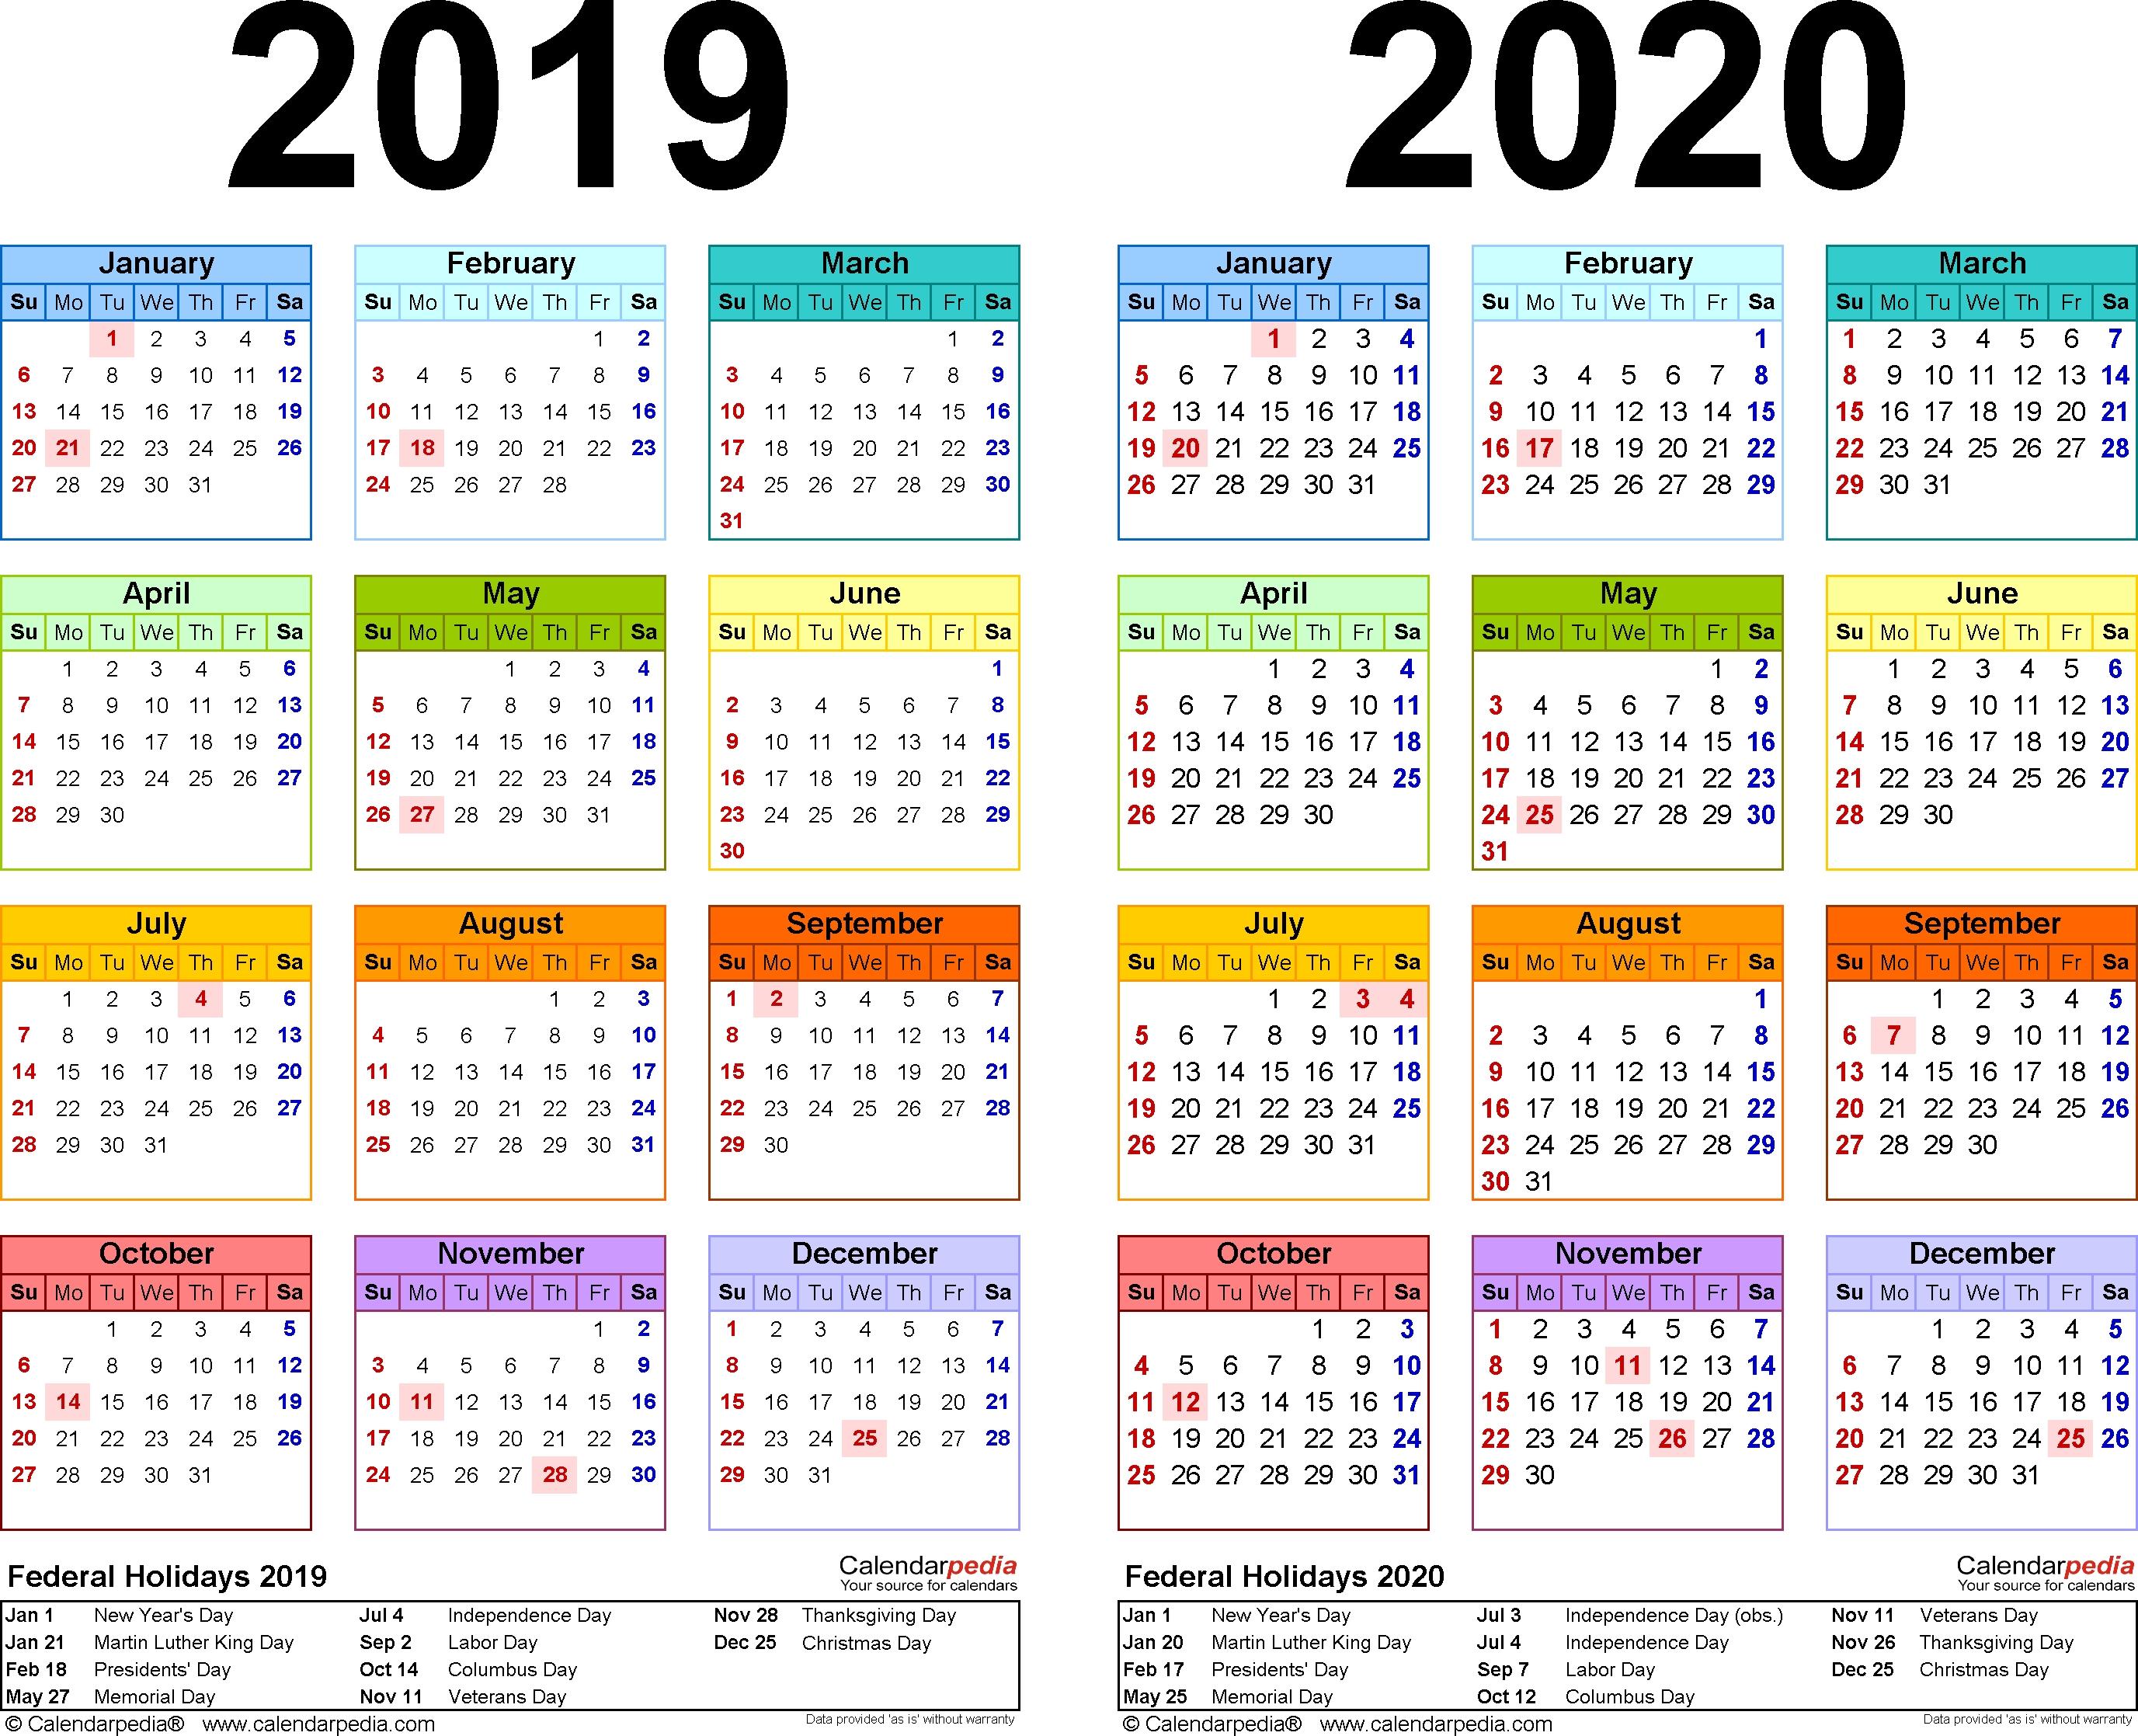 2019-2020 Calendar - Free Printable Two-Year Pdf Calendars_Calendar School Year 2020-18